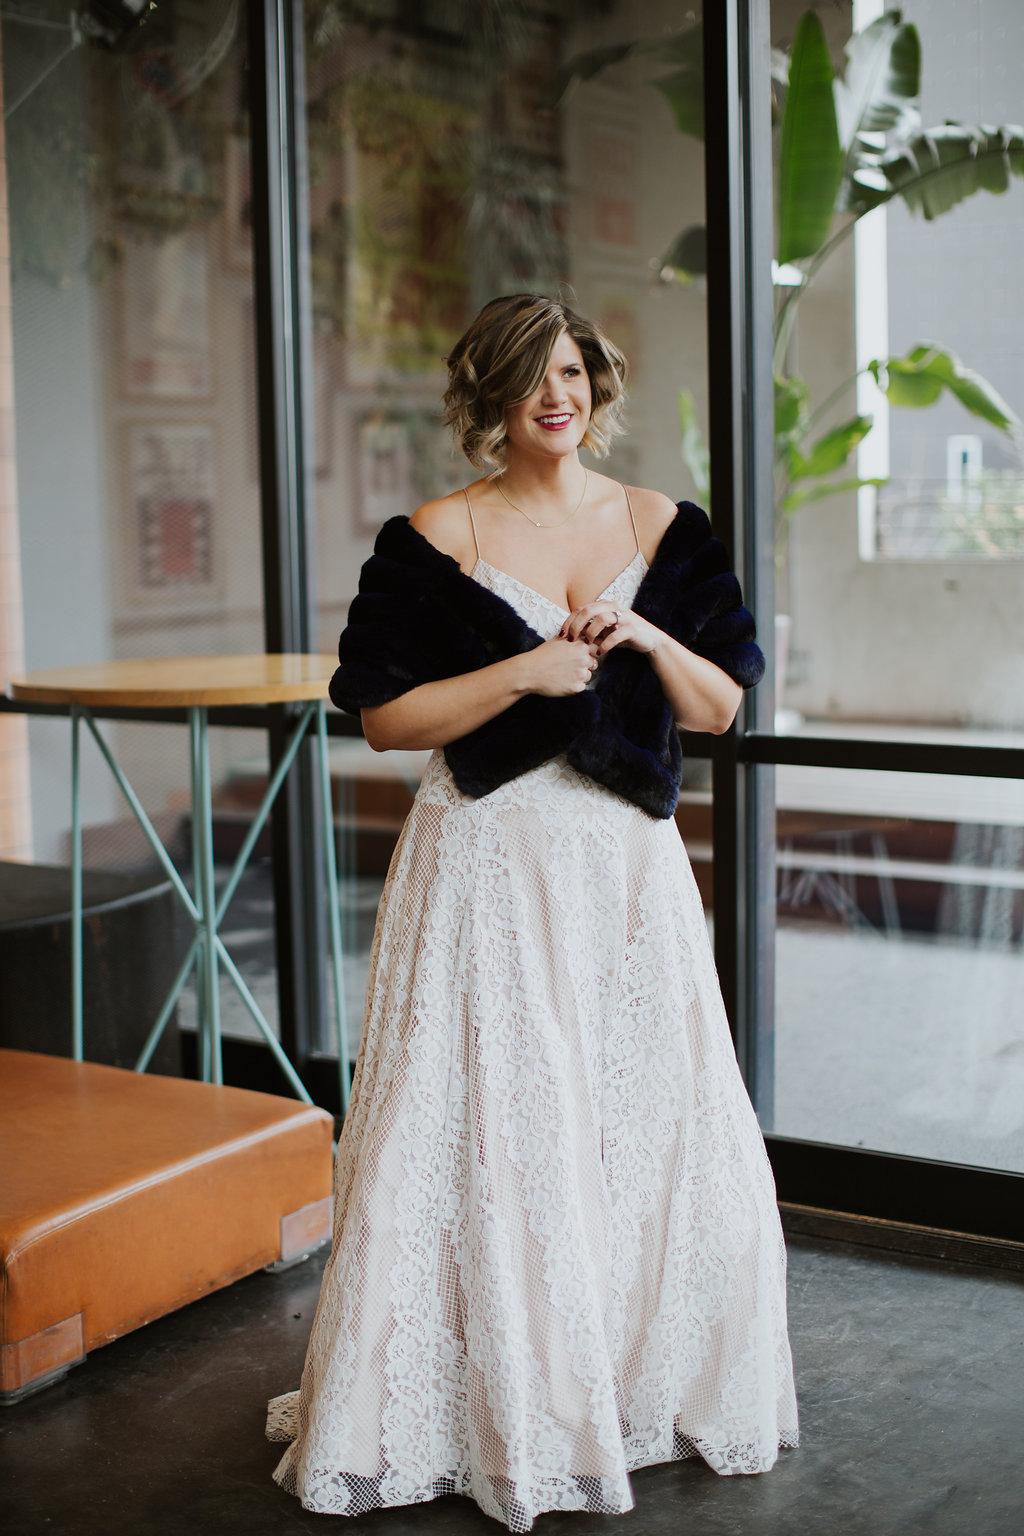 Paige-Newton-Intimate-Wedding-Photographer-Malverde-Wedding-Photography0014.jpg